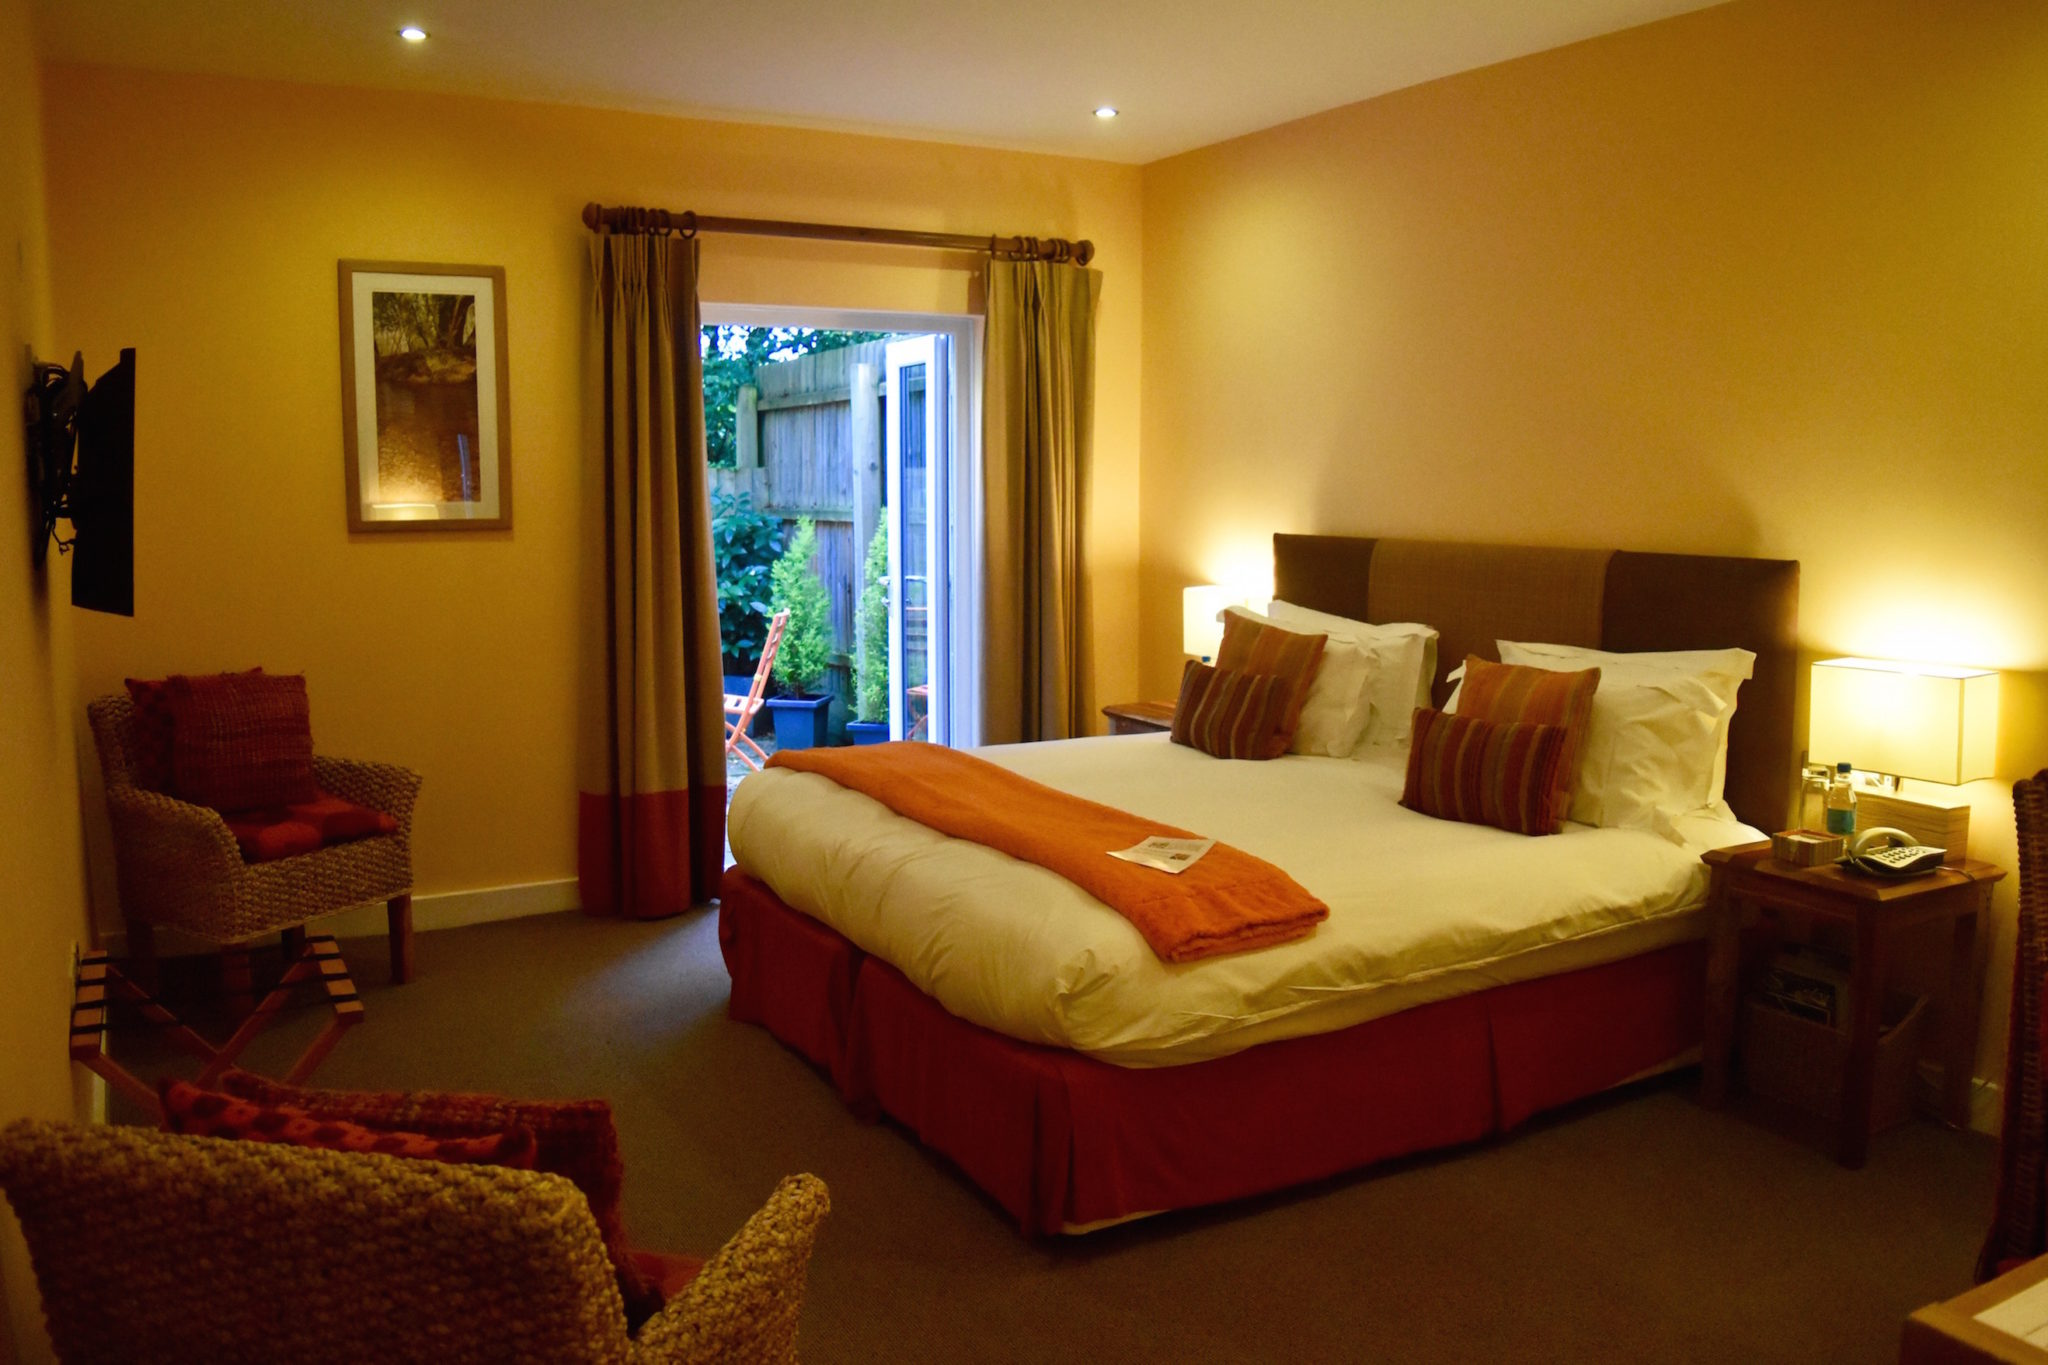 Hotel Terravina Rooms